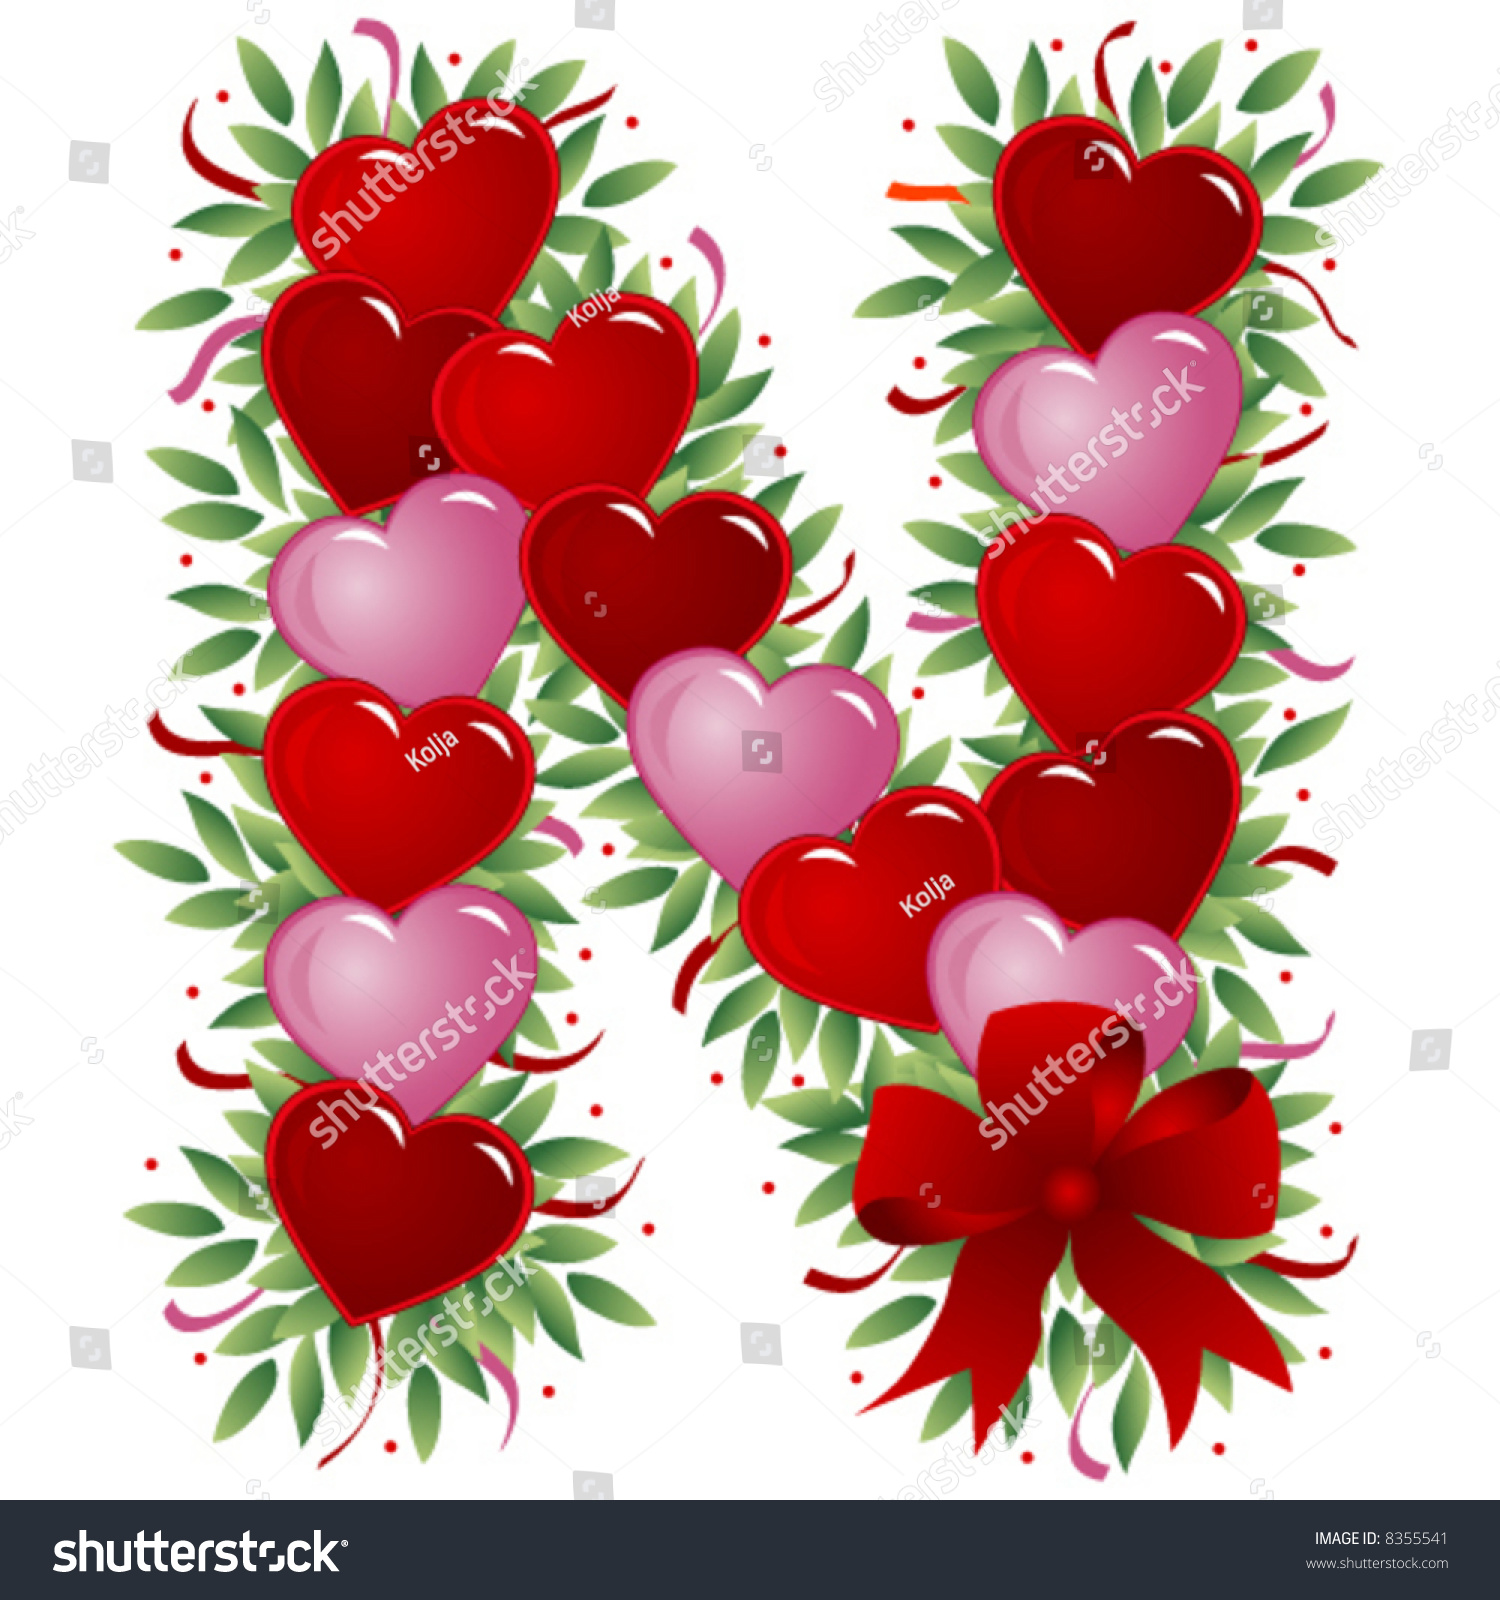 Letter n valentine 39 s love letters stock vector - N letter images ...